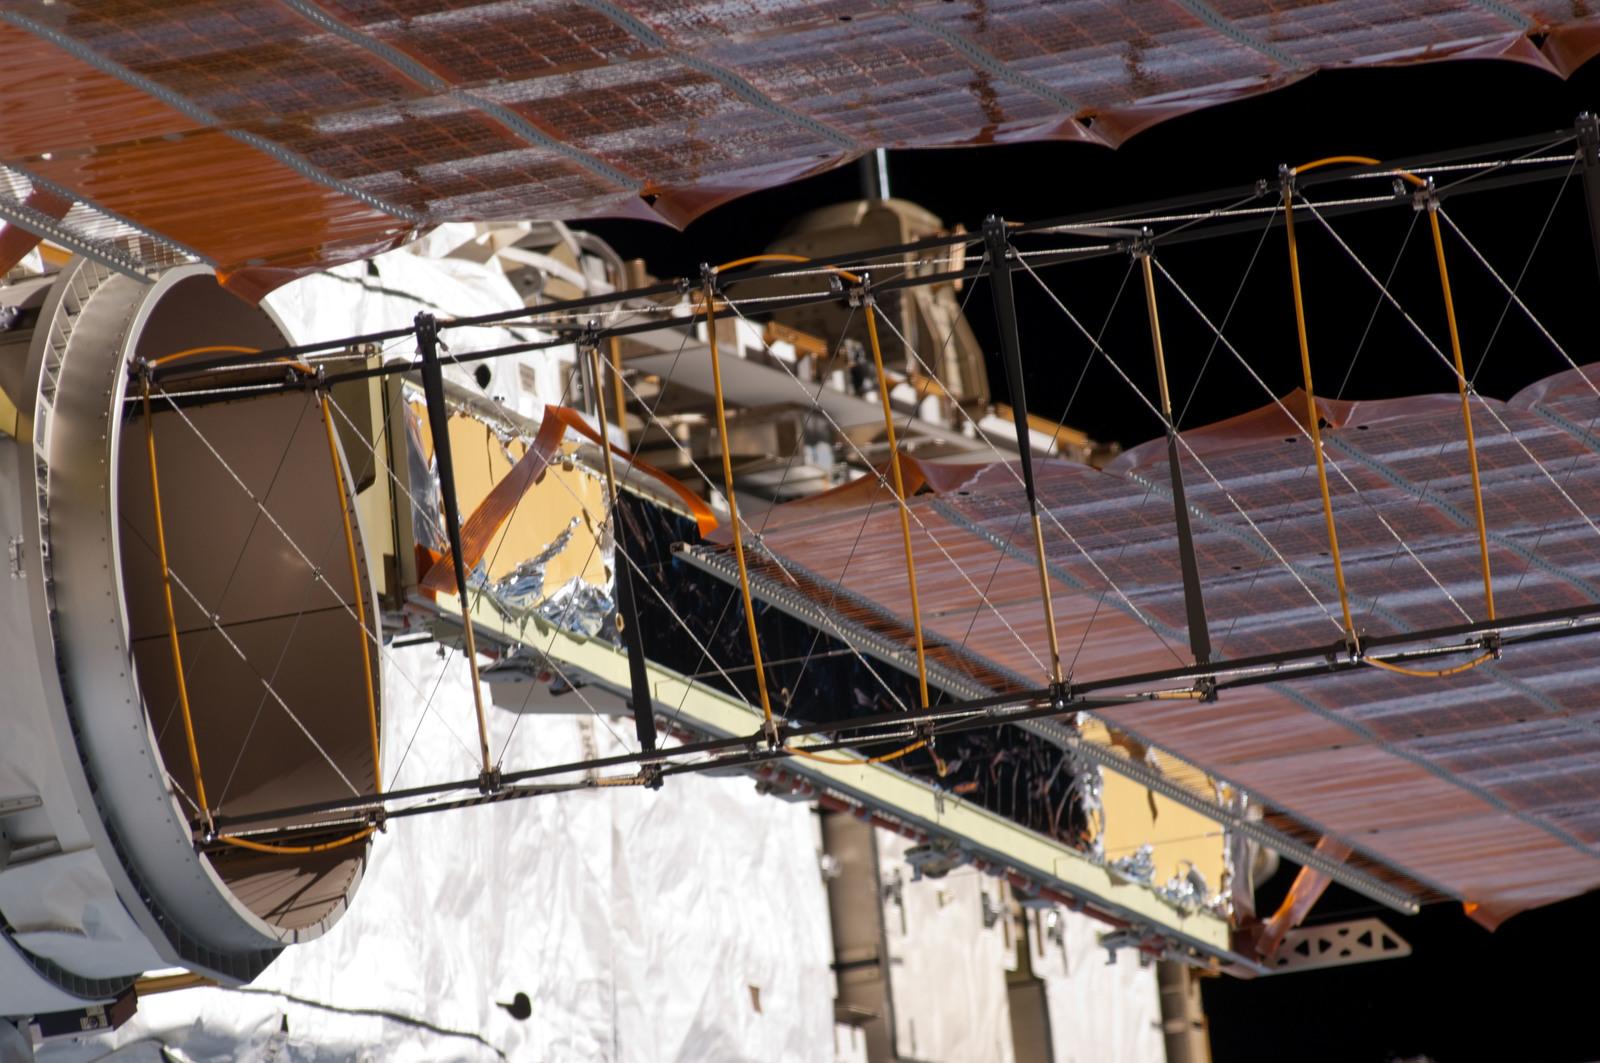 S124E008391 - STS-124 - P4 Truss  SAW